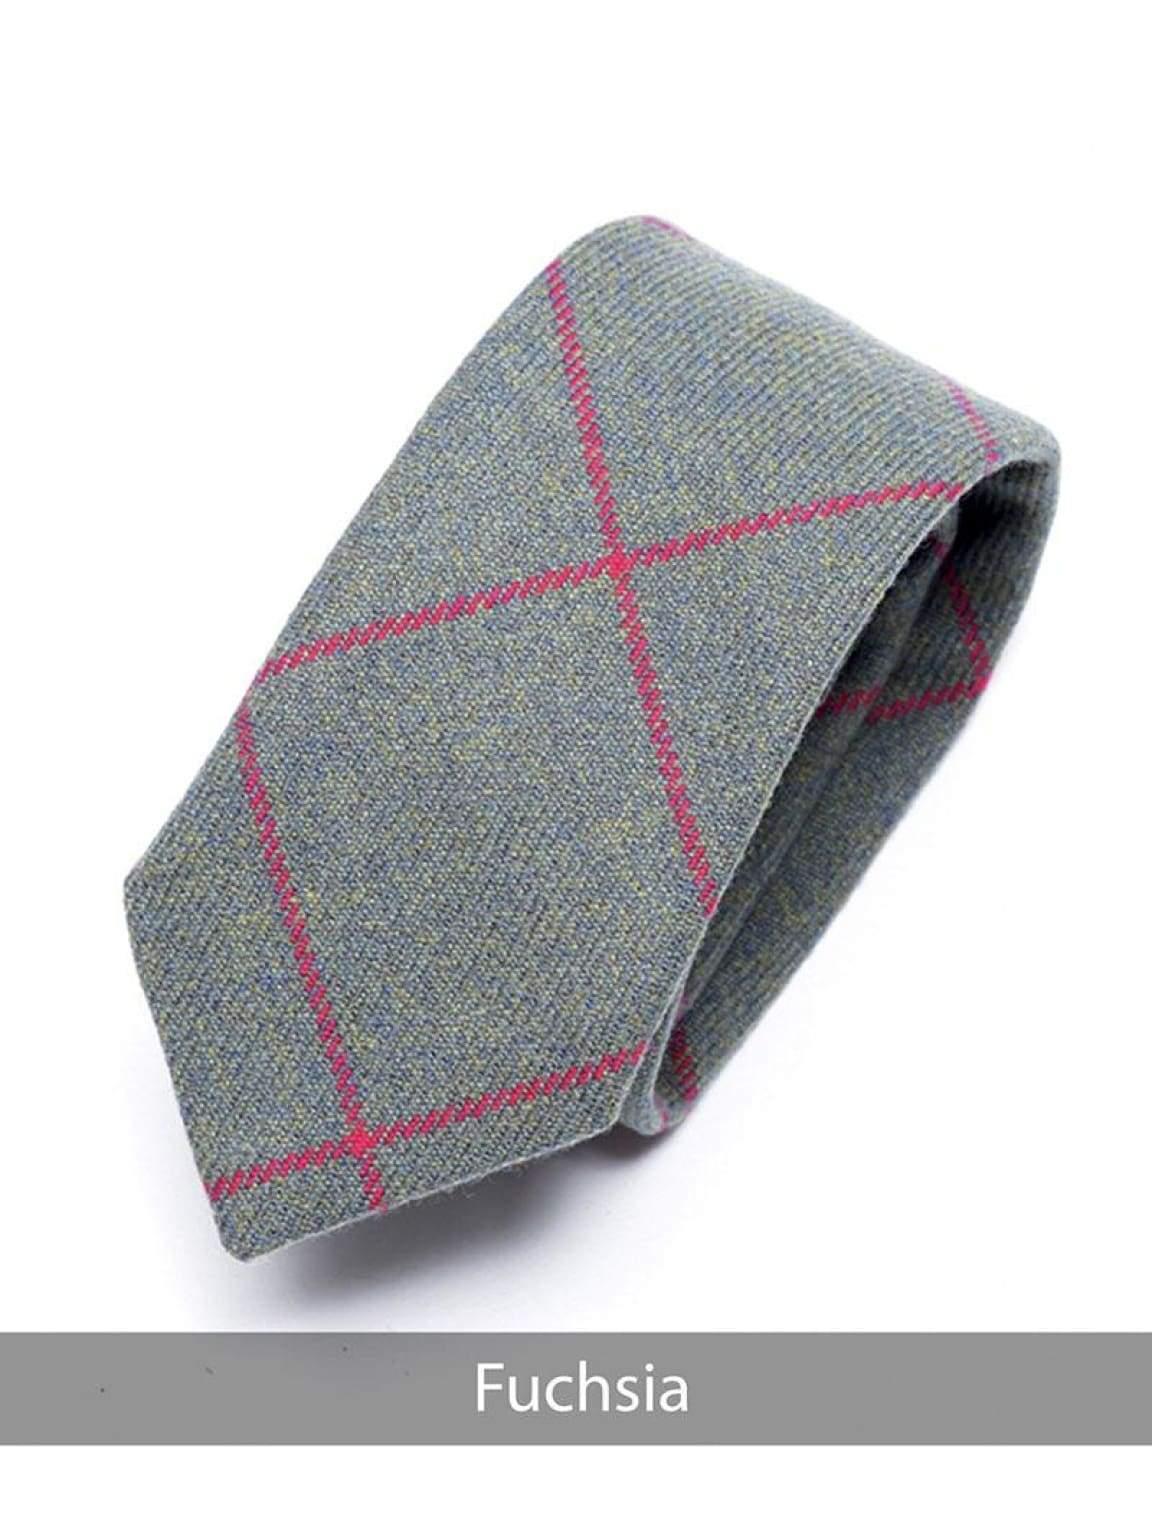 Heirloom Fuchsia Mens Checked Tie - Accessories